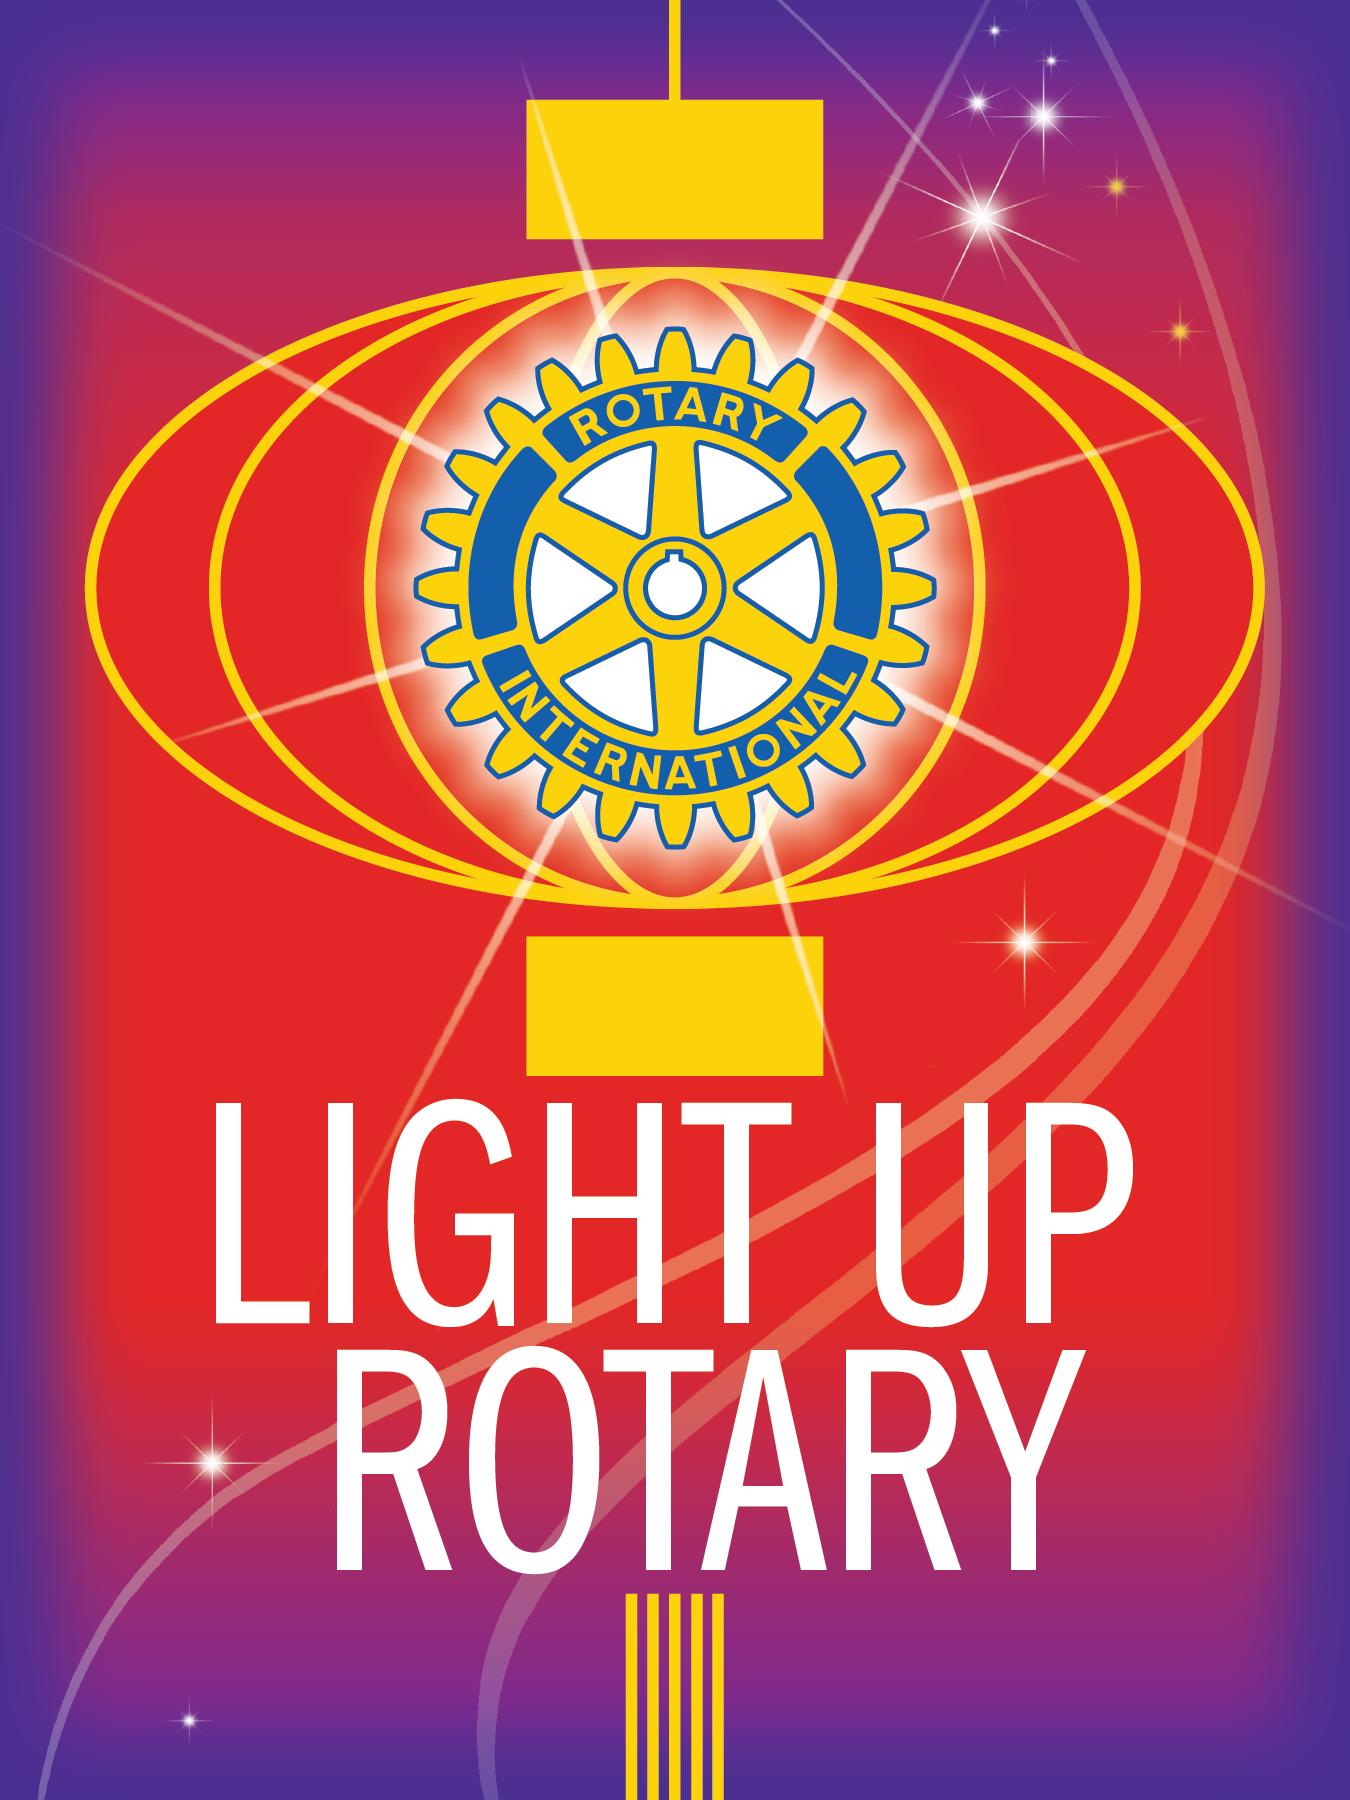 rotary international theme light up rotary 2014 15